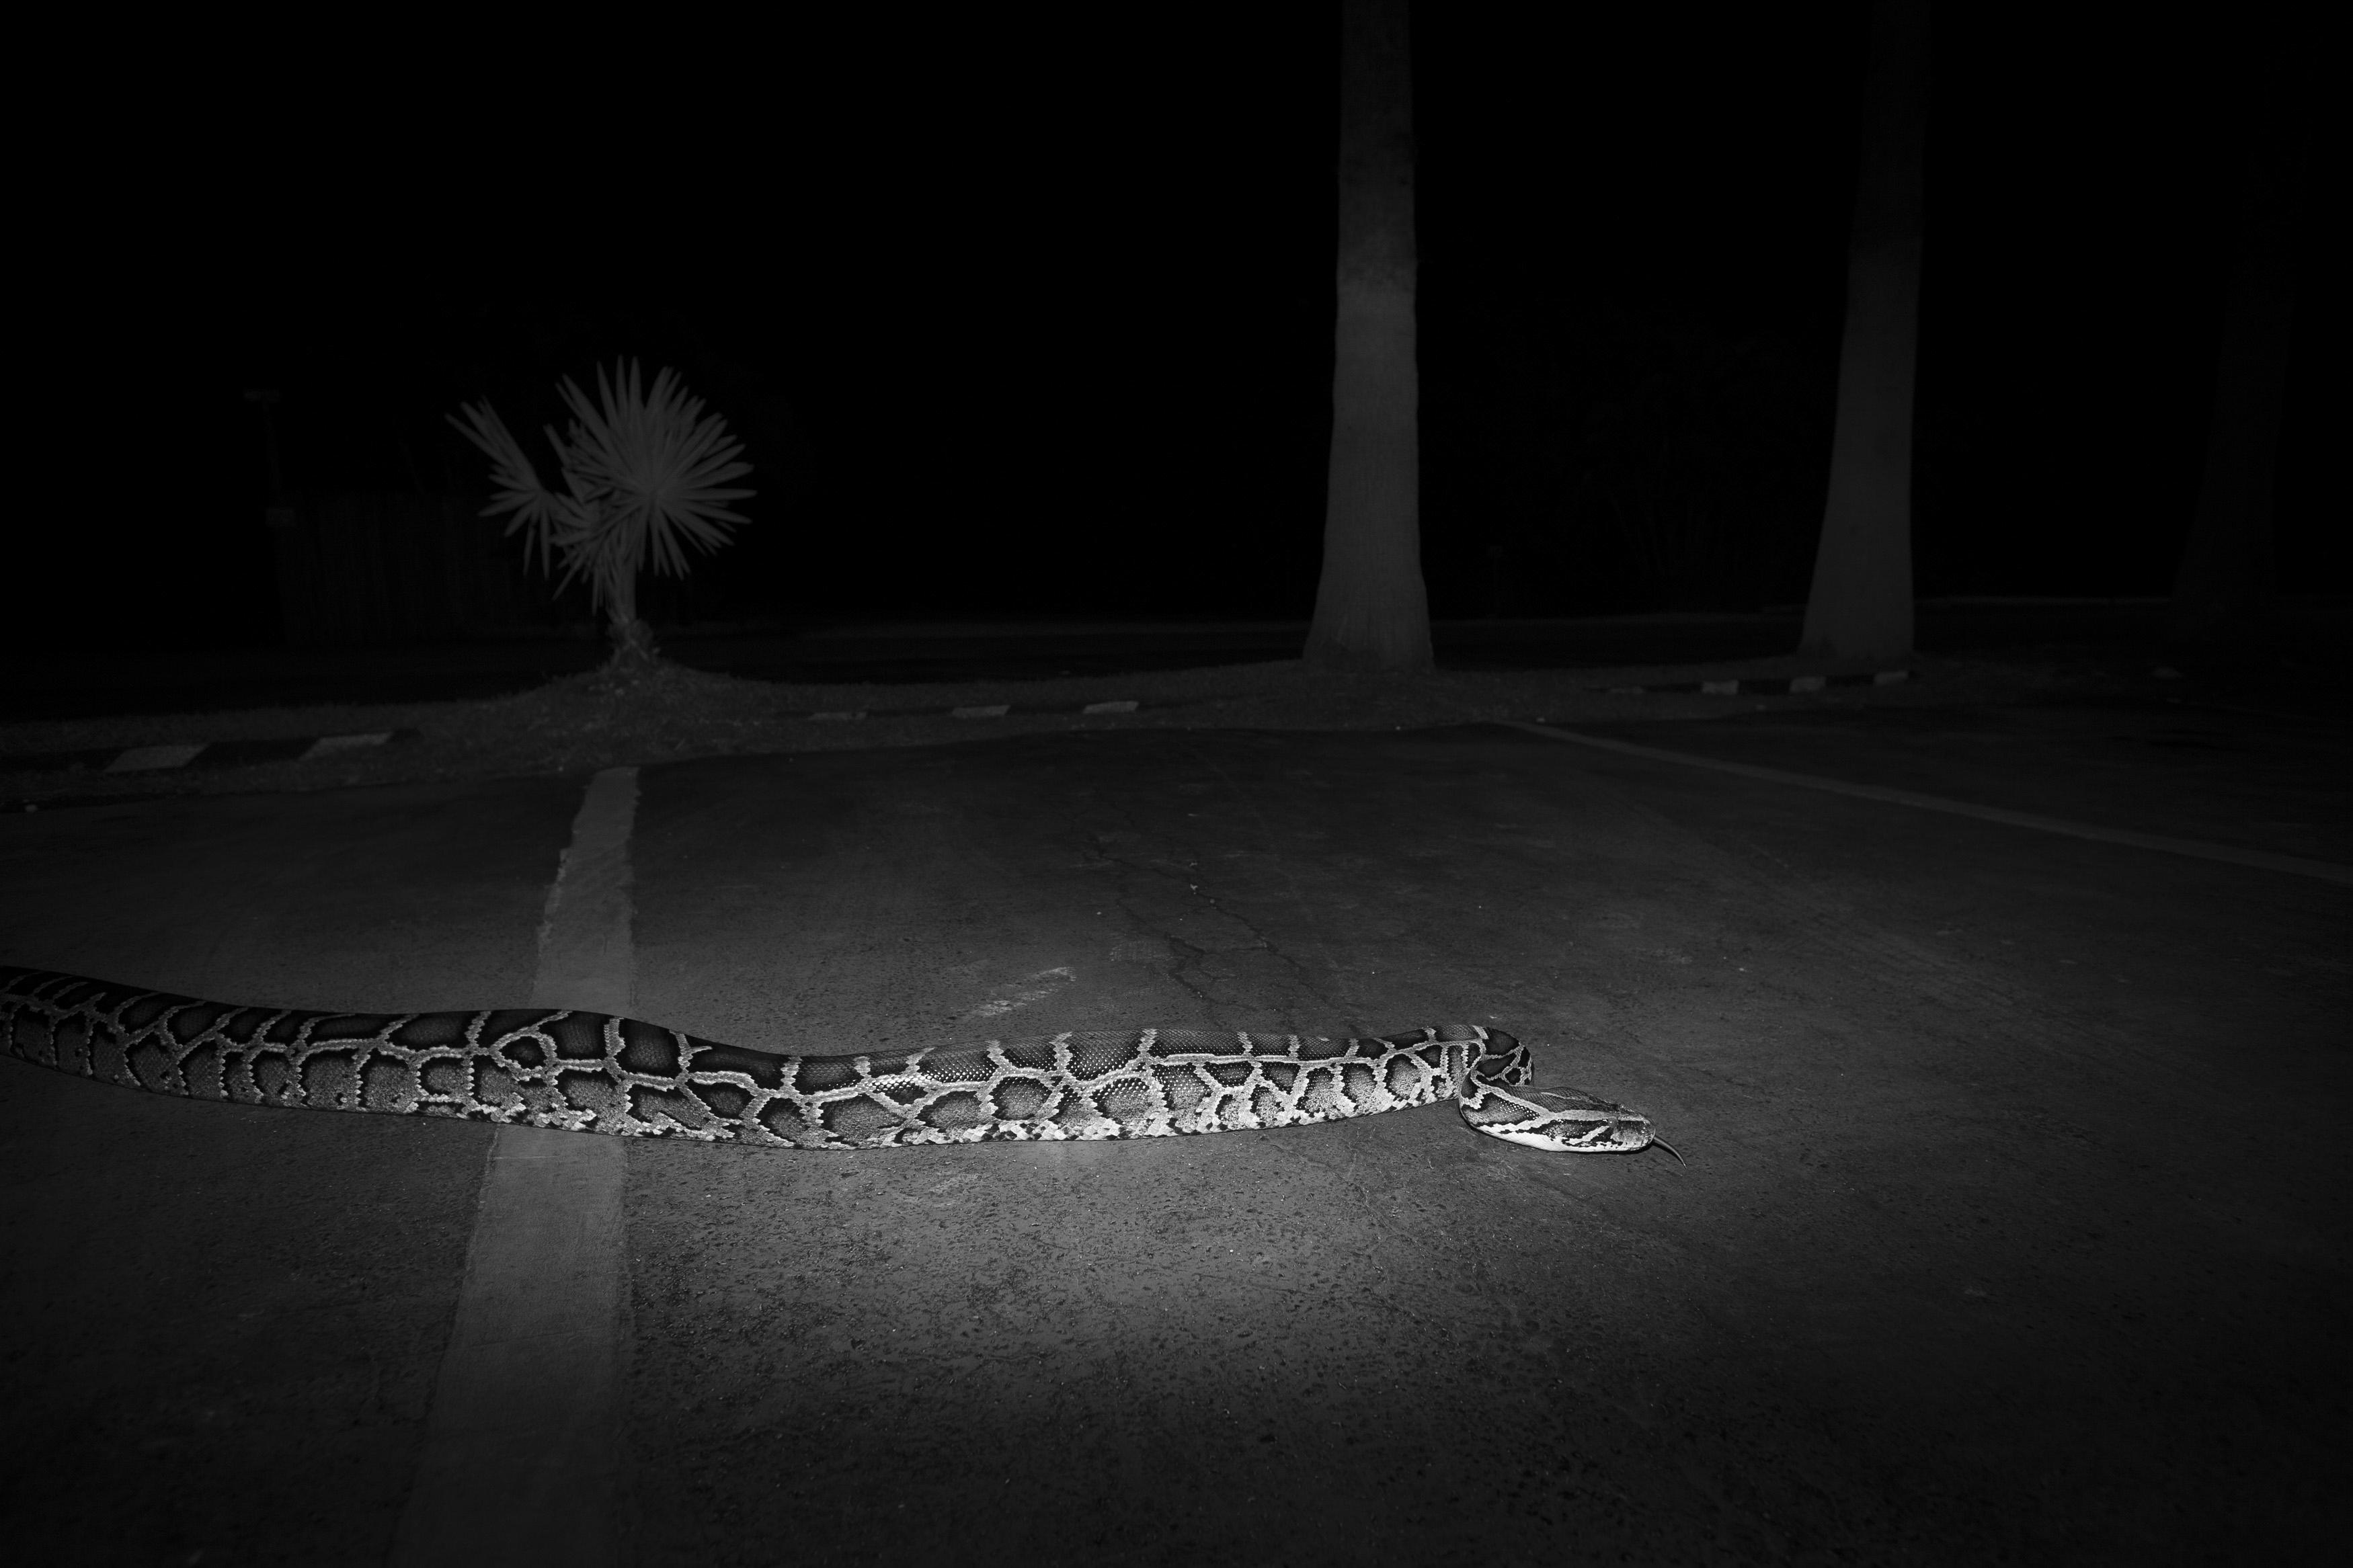 Burmese_Python,_Parking_Lot,_Everglades